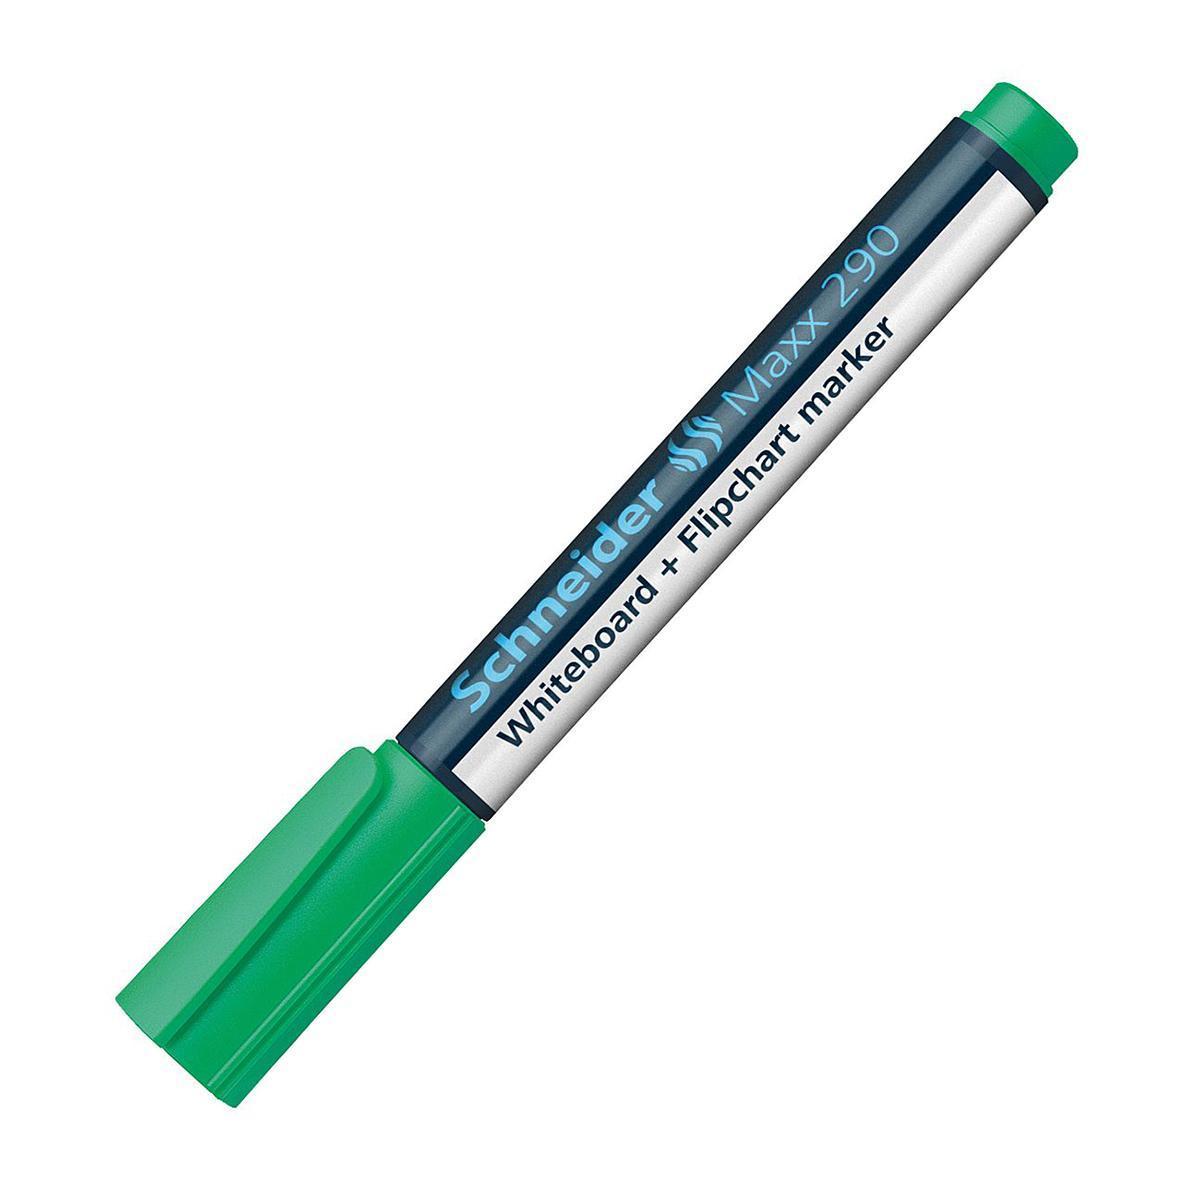 Универсальный маркер Whiteboard and Flipchart Maxx Eco 290; 1-3 мм,зеленый.